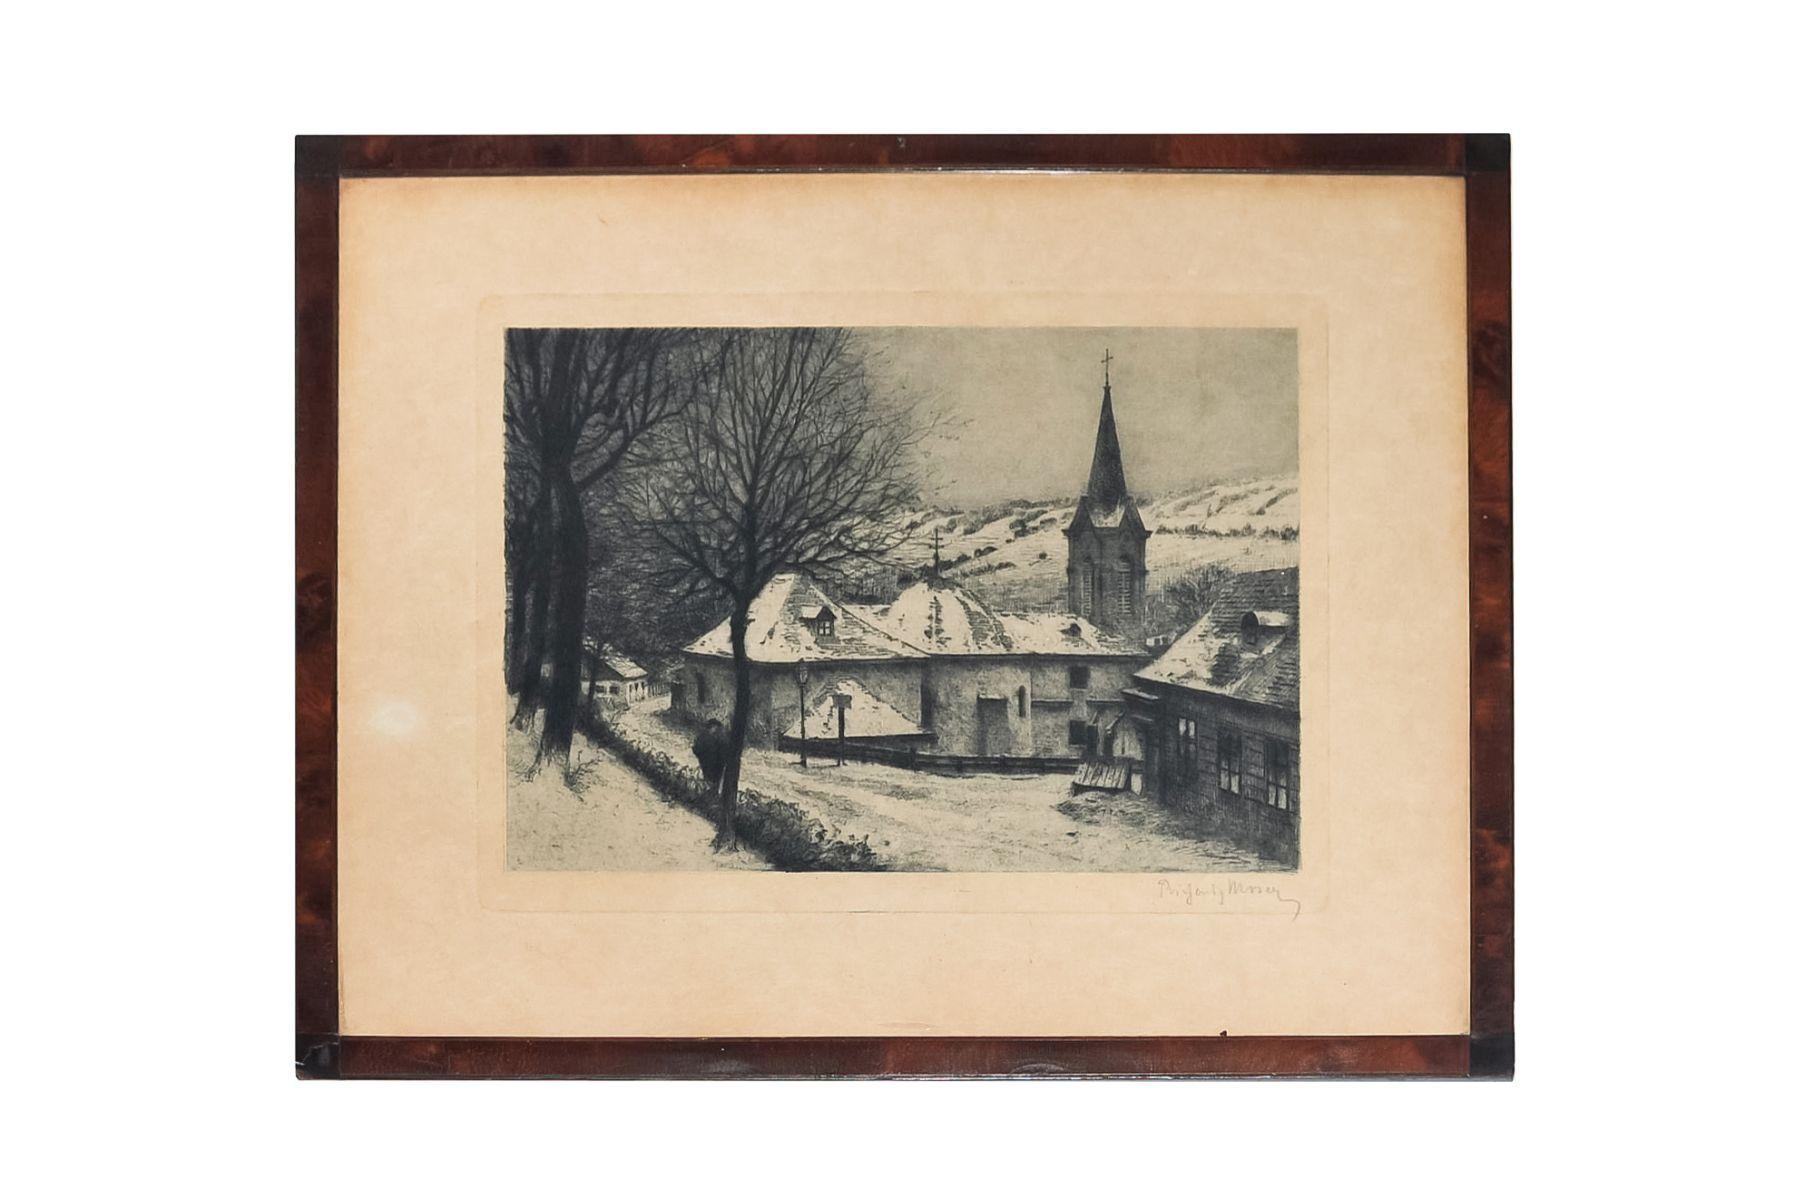 #18 Richard Moser 1874-1924 Image